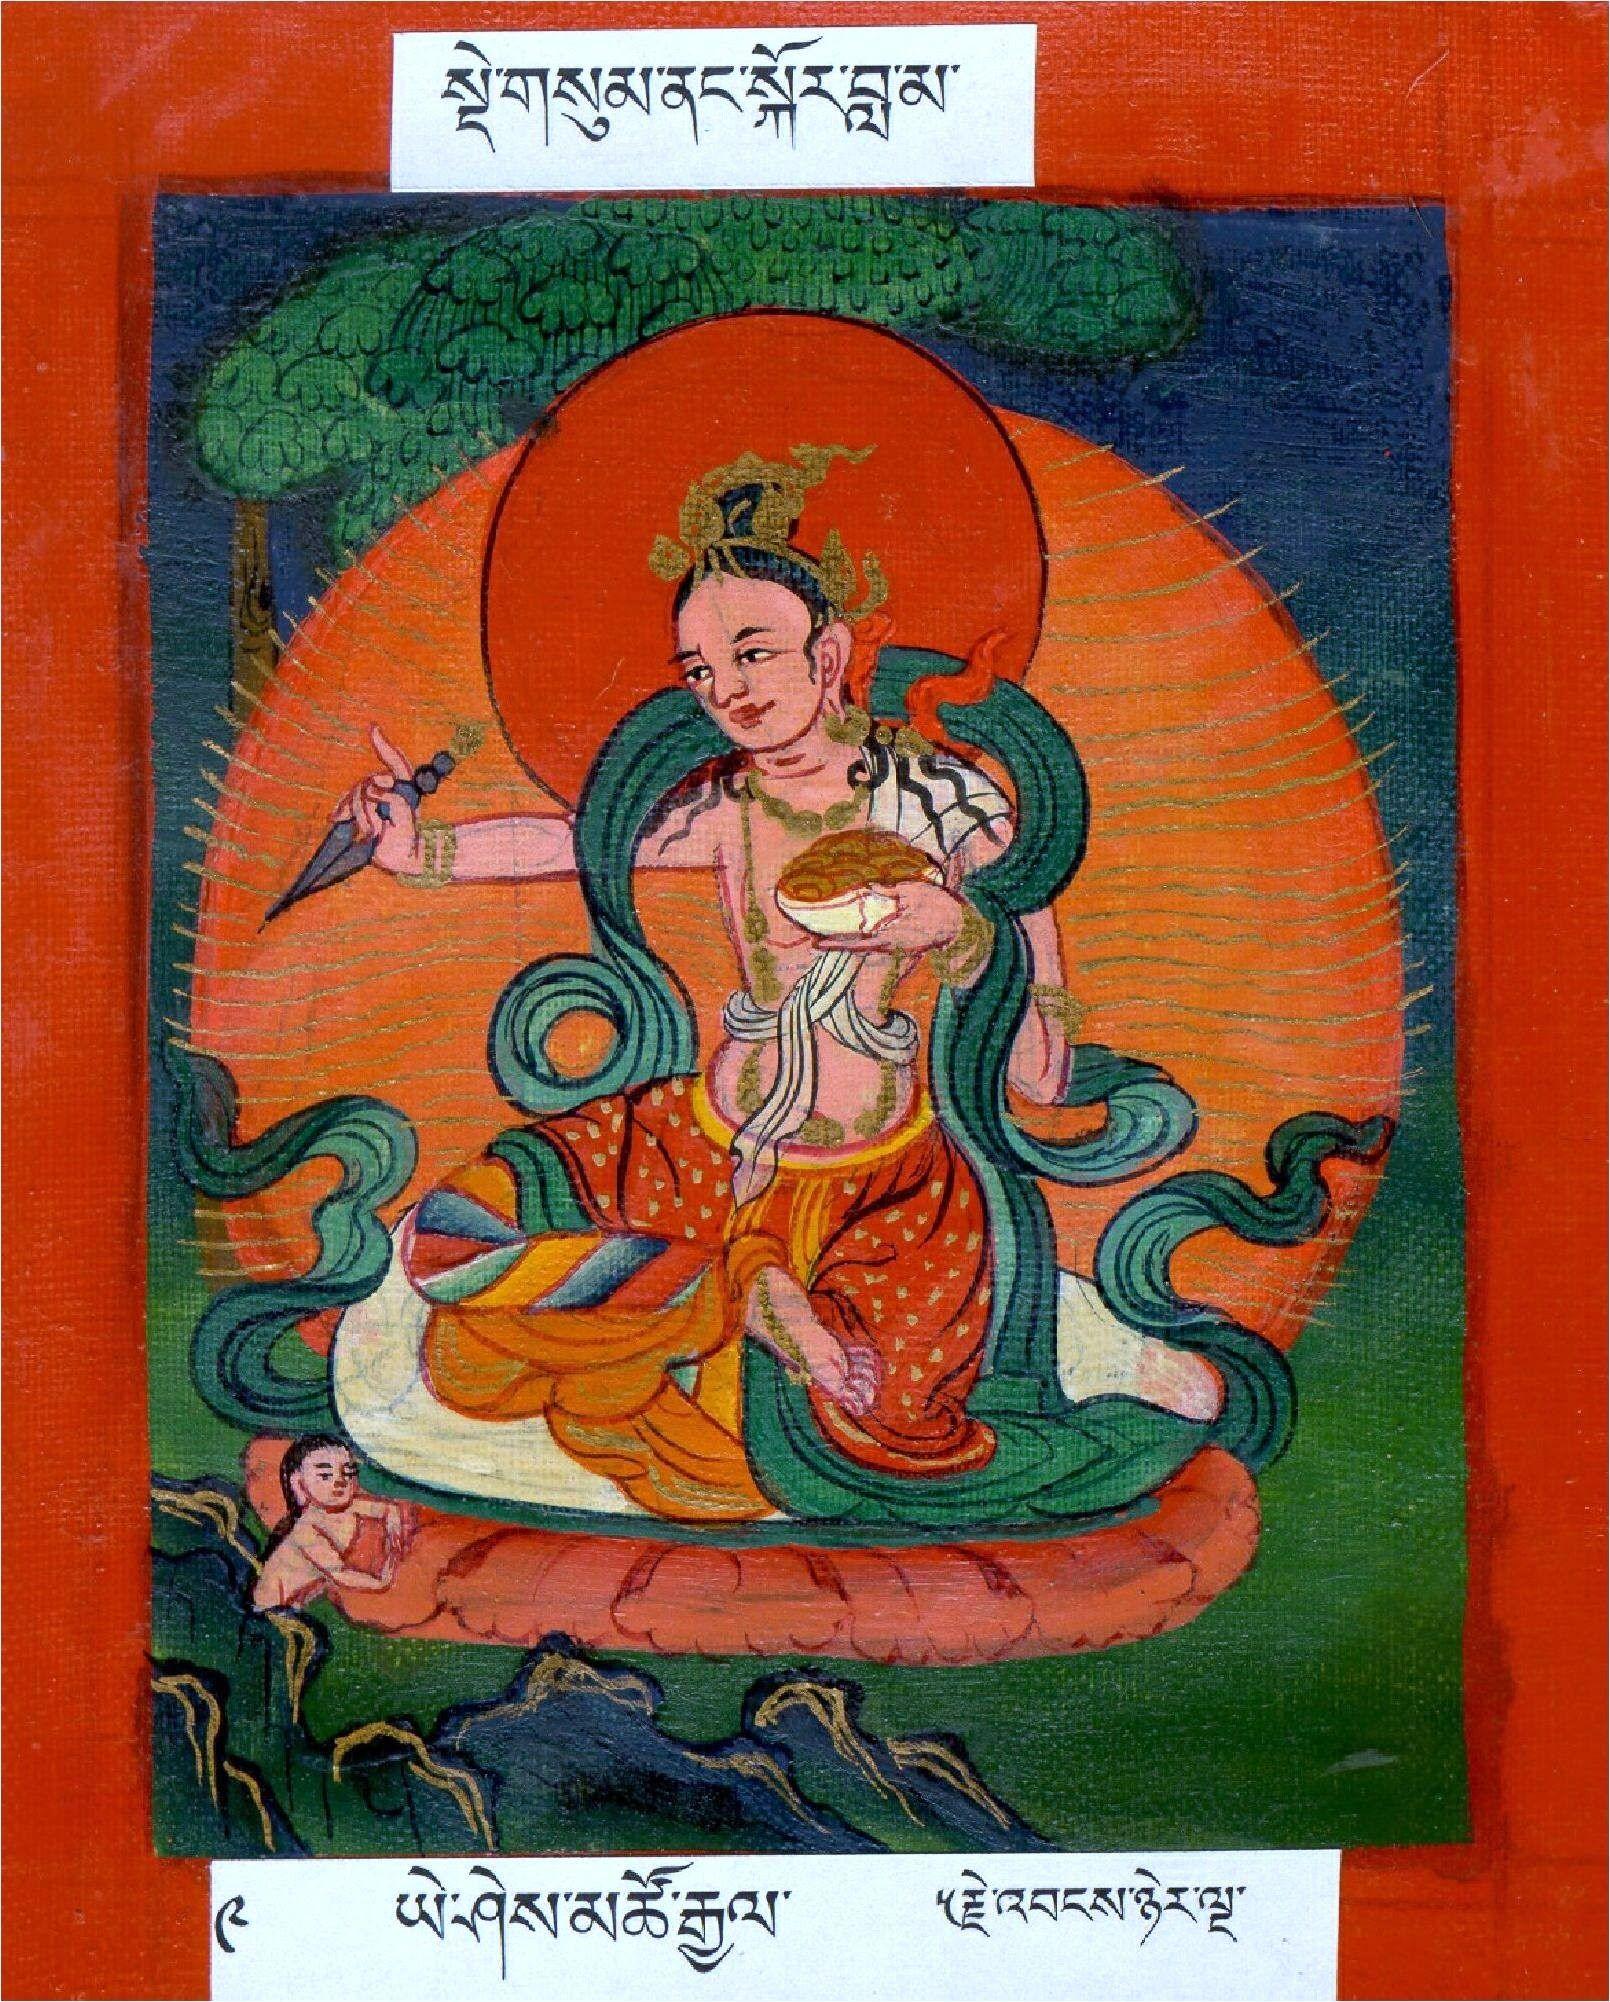 Yeshe Tsogyal, Consort Of Padmasmanhava Key In The Founding Of